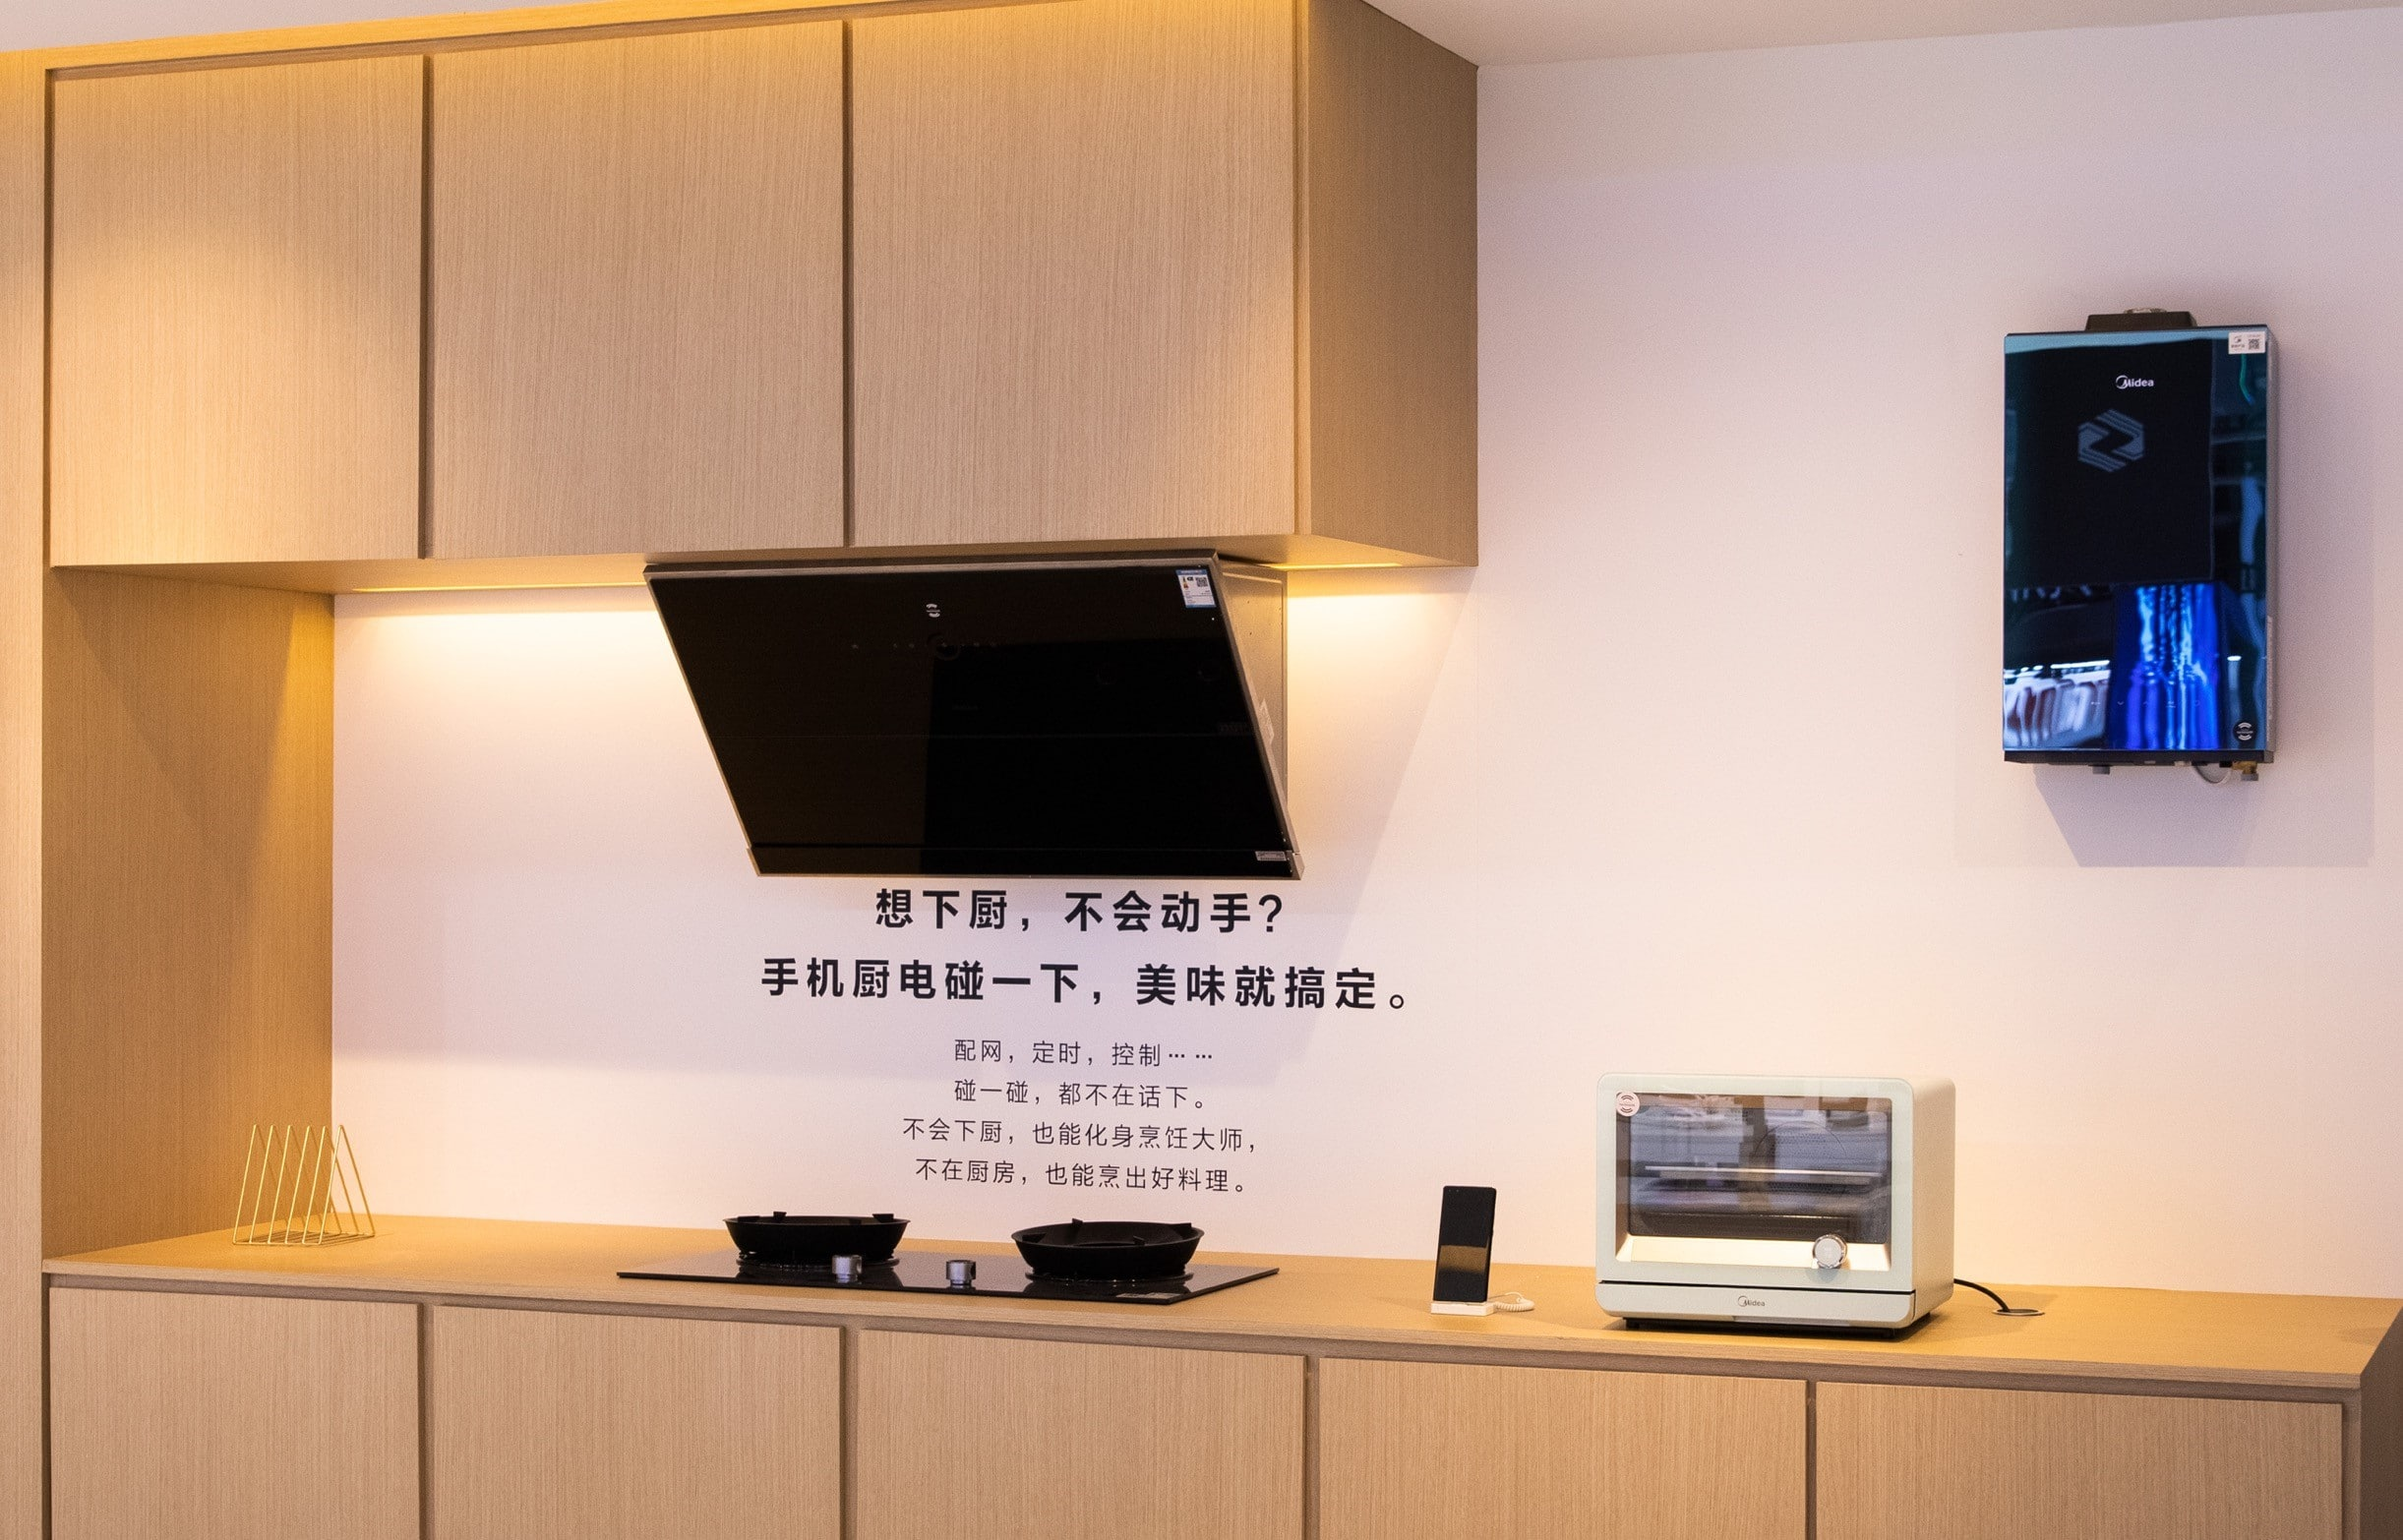 Huawei predstavio projekt pametne kuce na MWC Shanghaiju 2